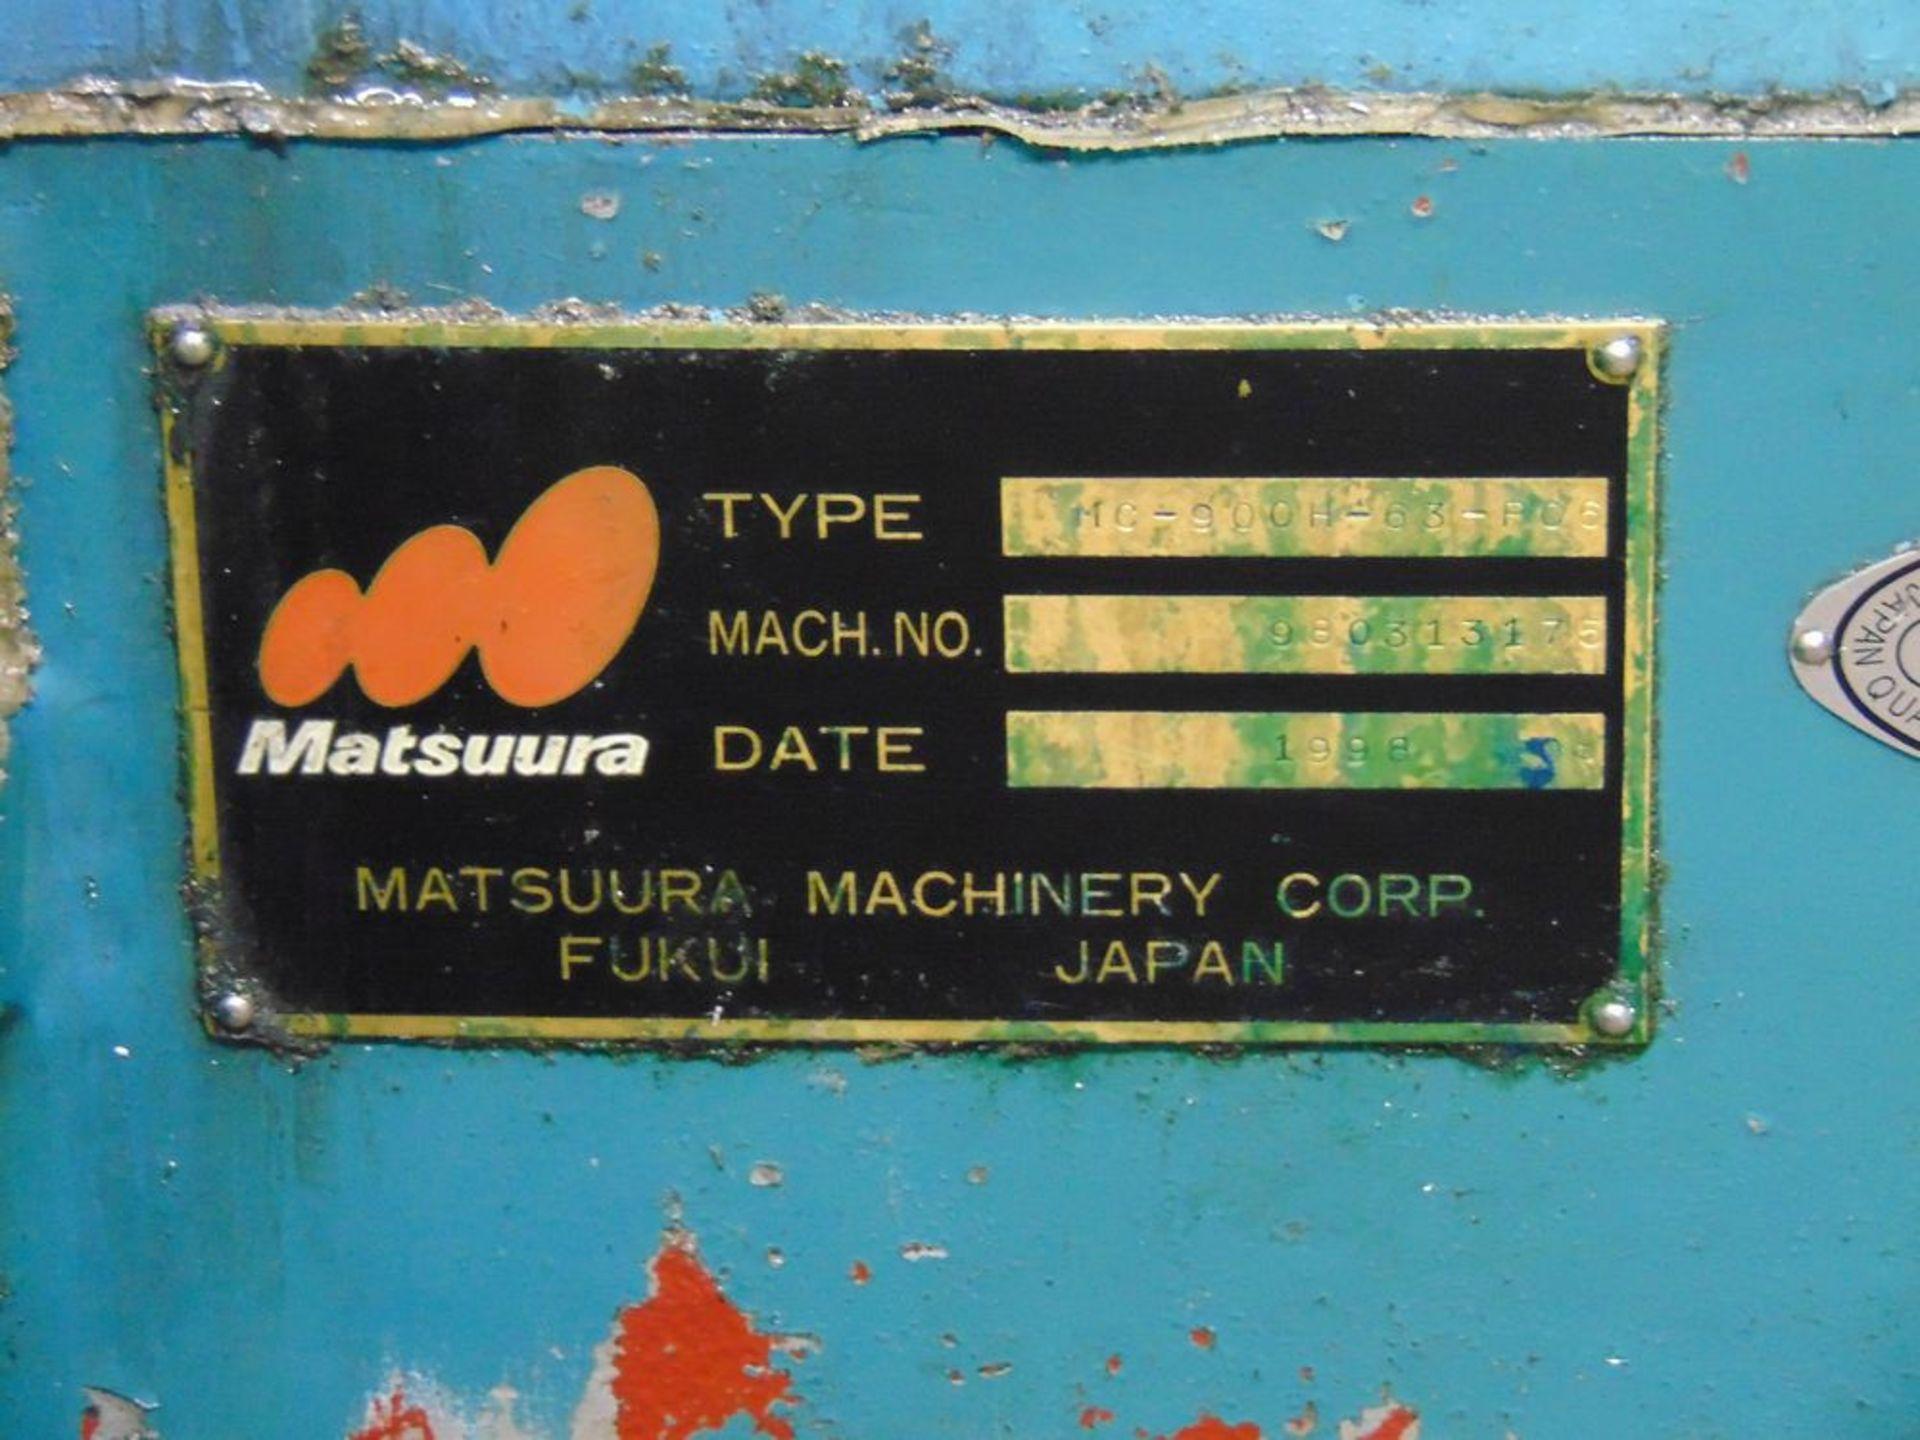 Lot 23 - (1998) Matsuura mod. MC900 H-63-PC6, 4-Axis CNC Horizontal Machine Center w/ Fanuc 15M Controls, 6-